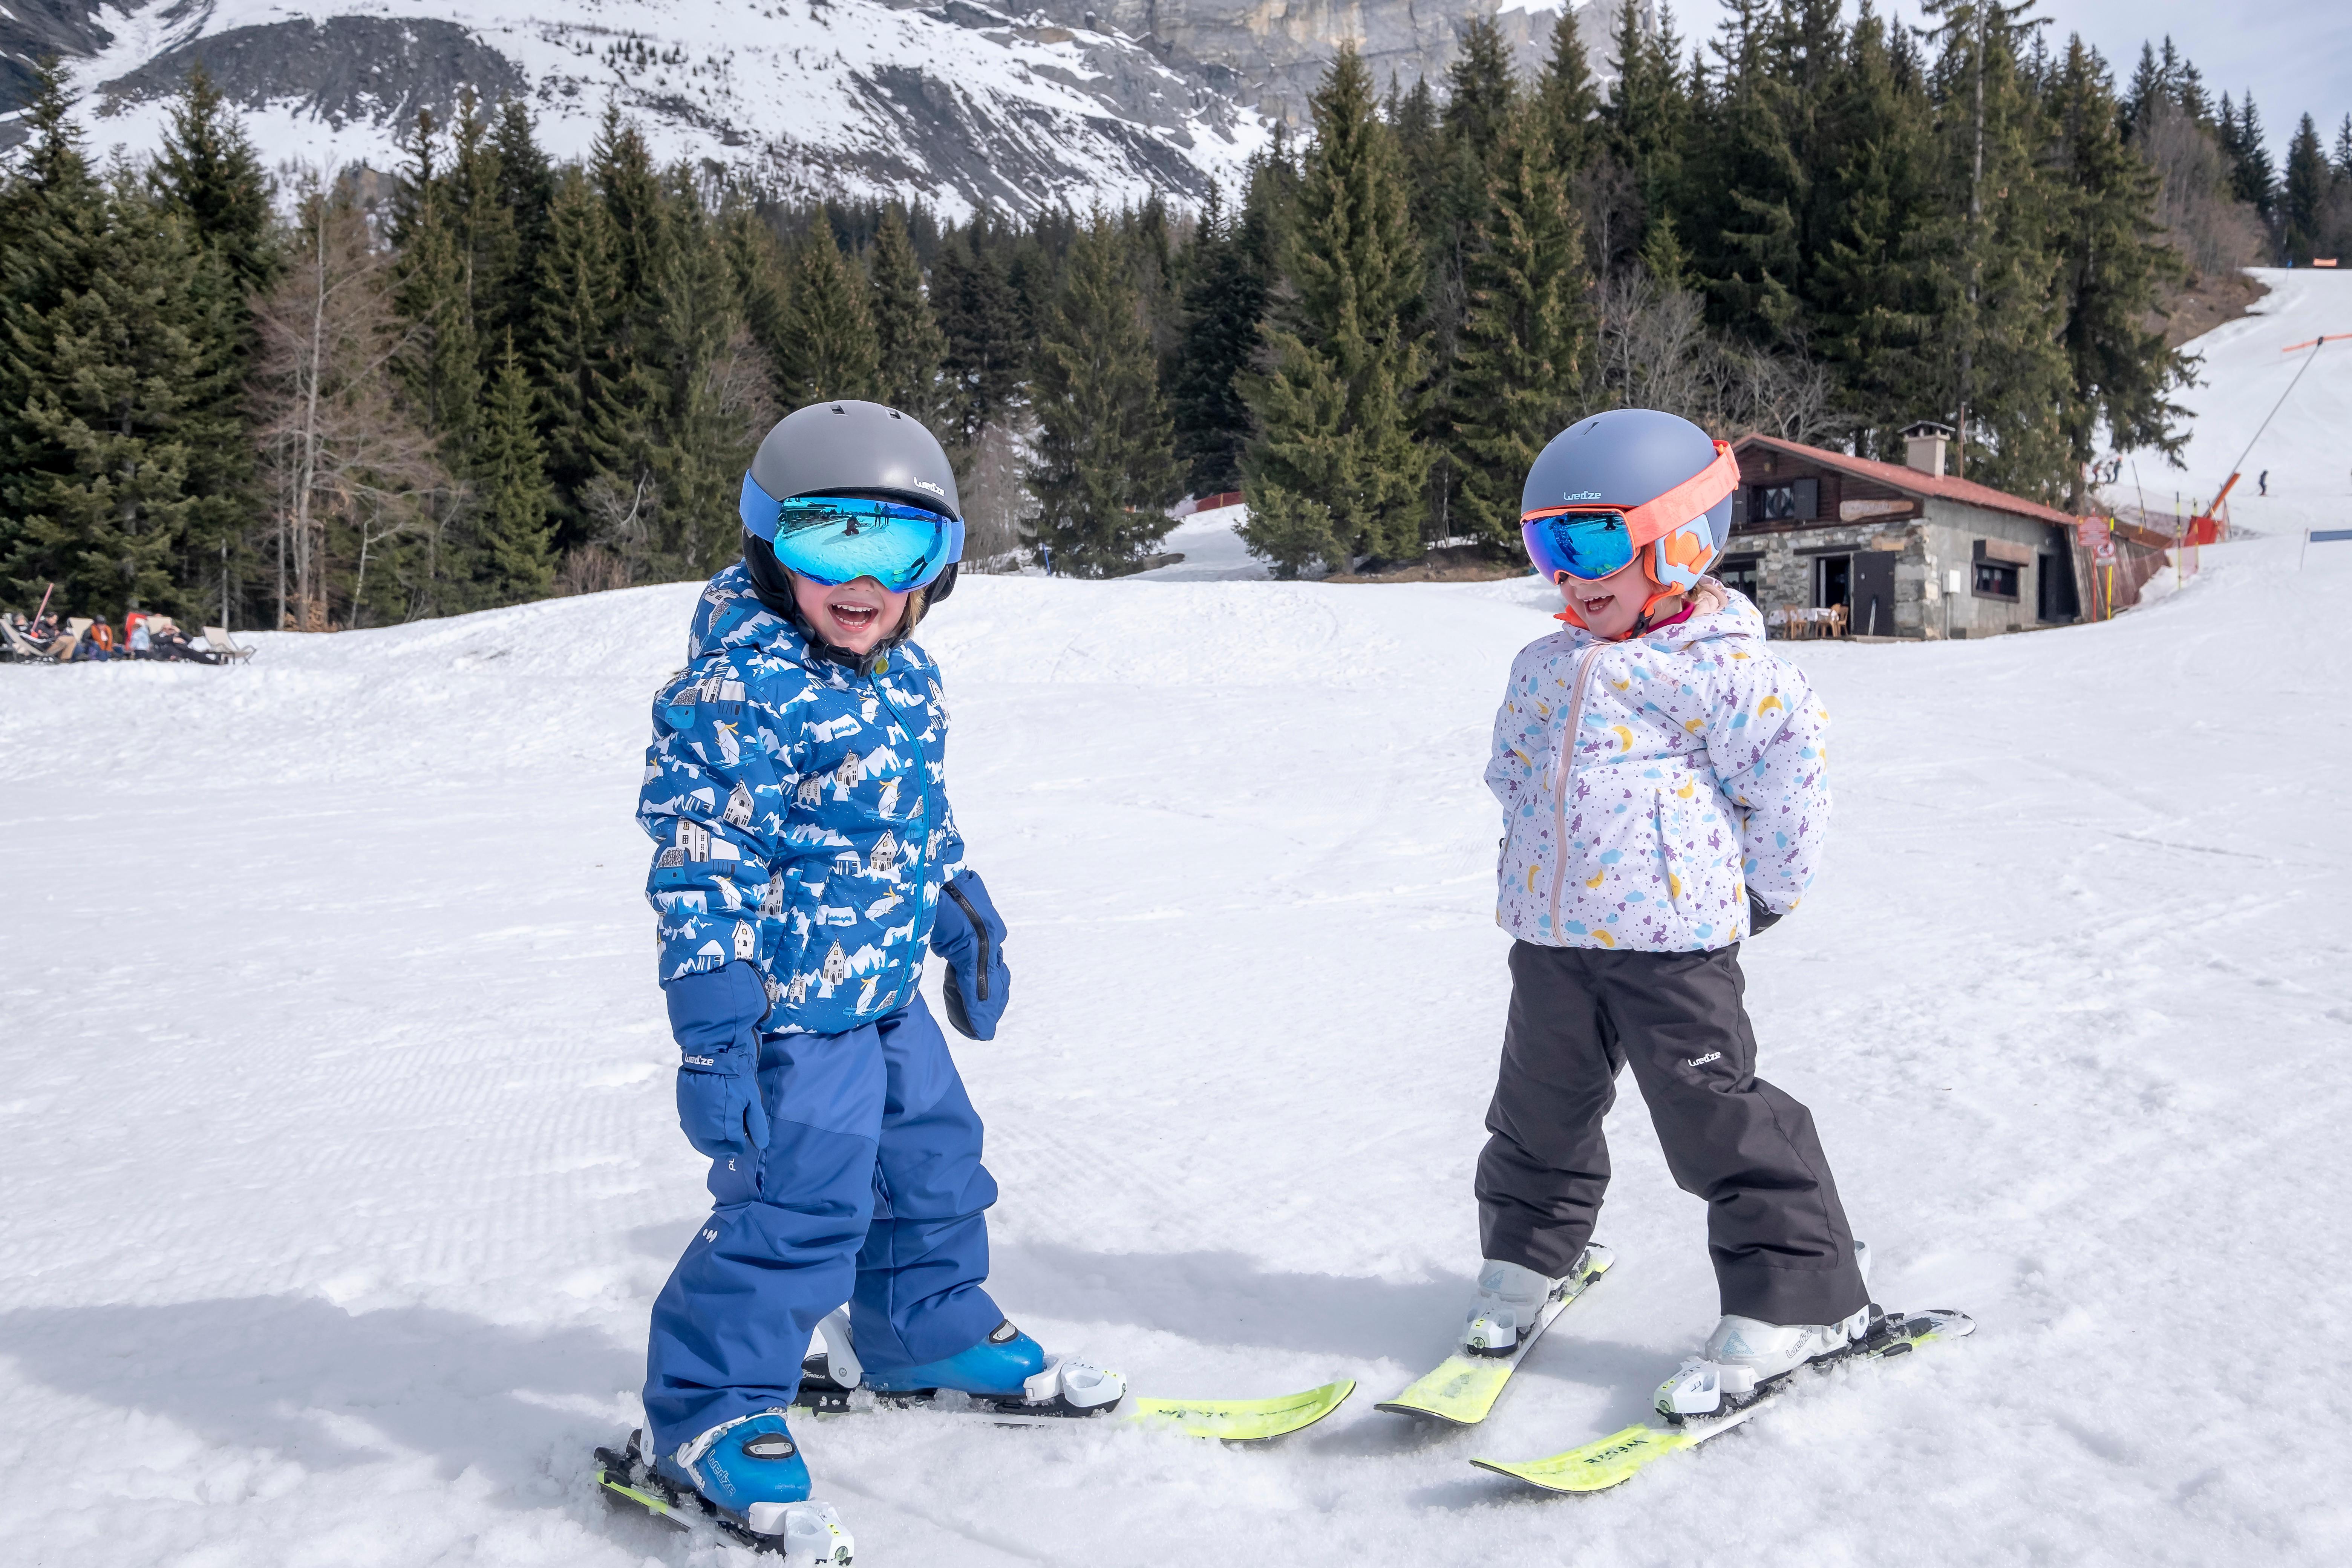 Skibeleidung Kinder